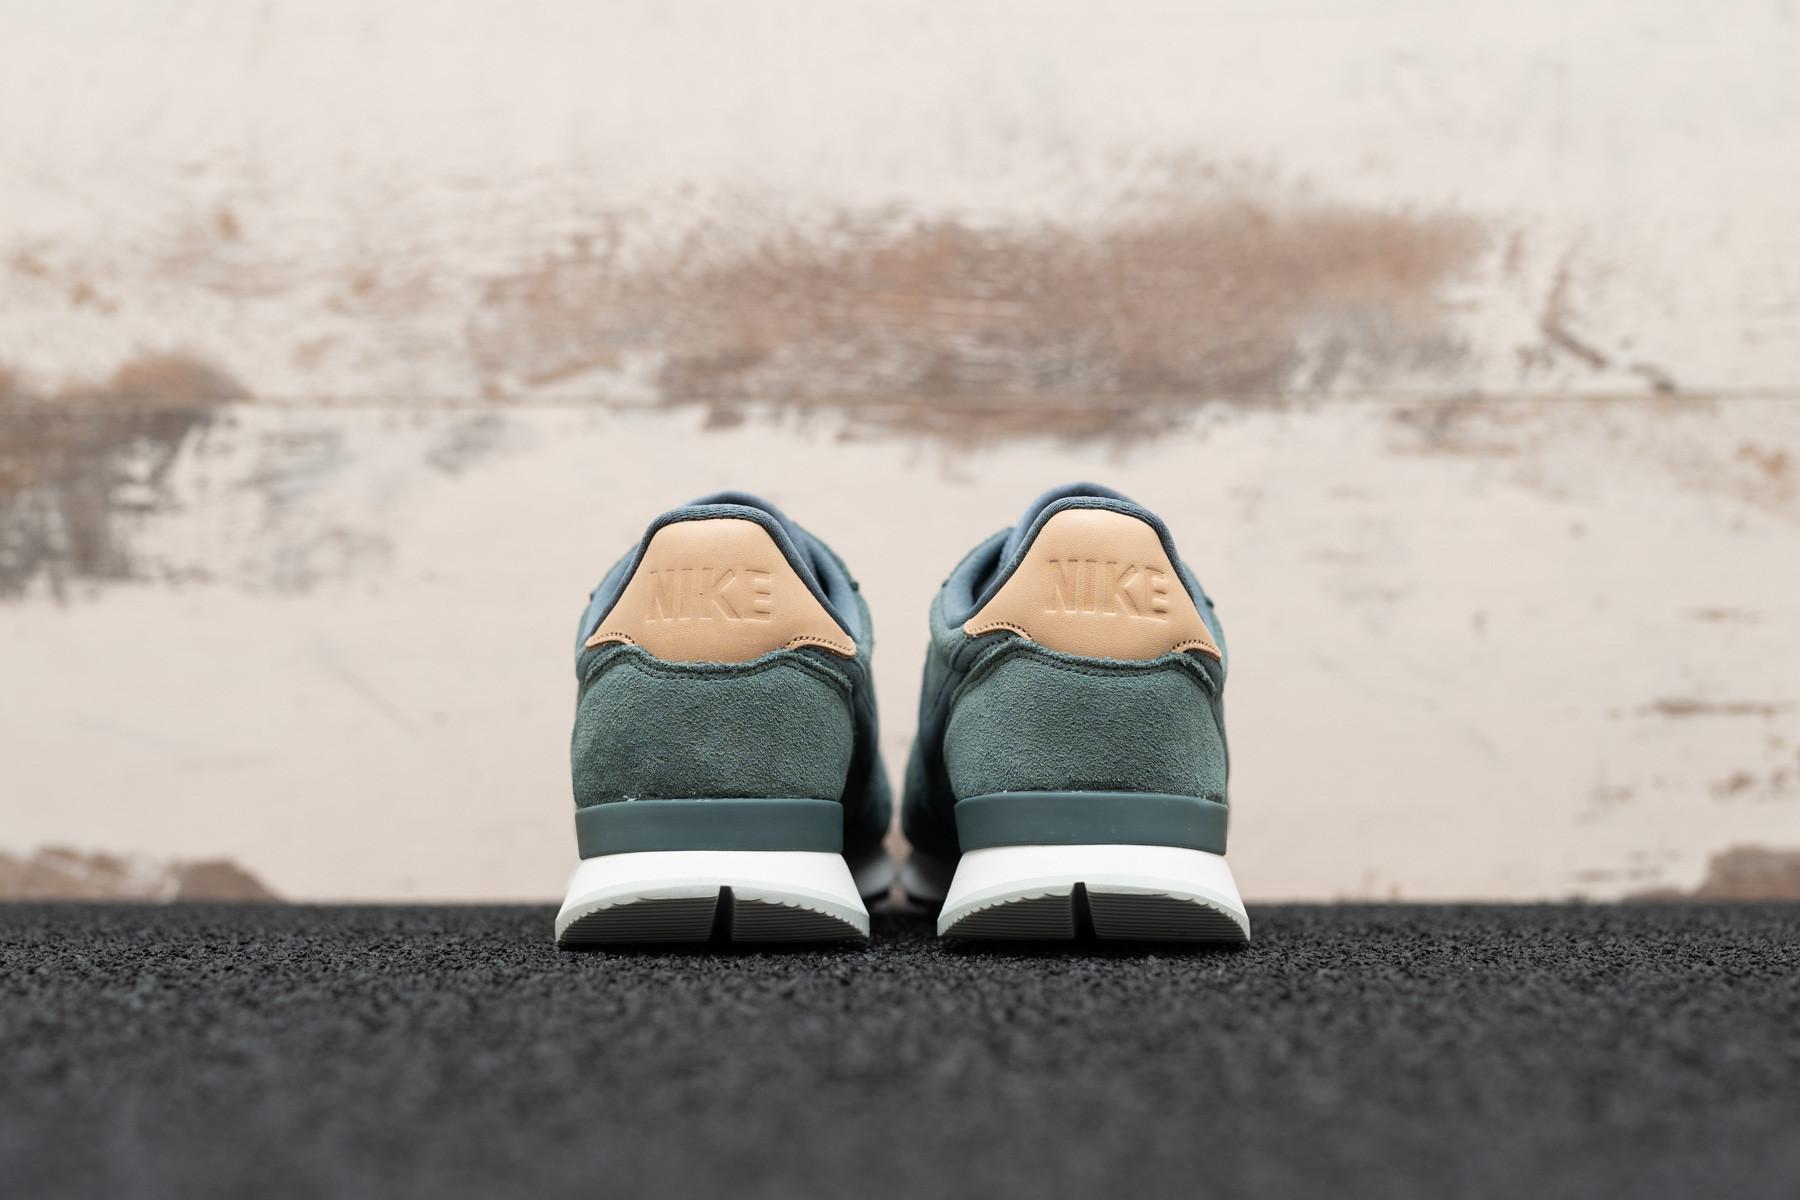 new style 9e08b 046c0 W Nike Internationalist PRM